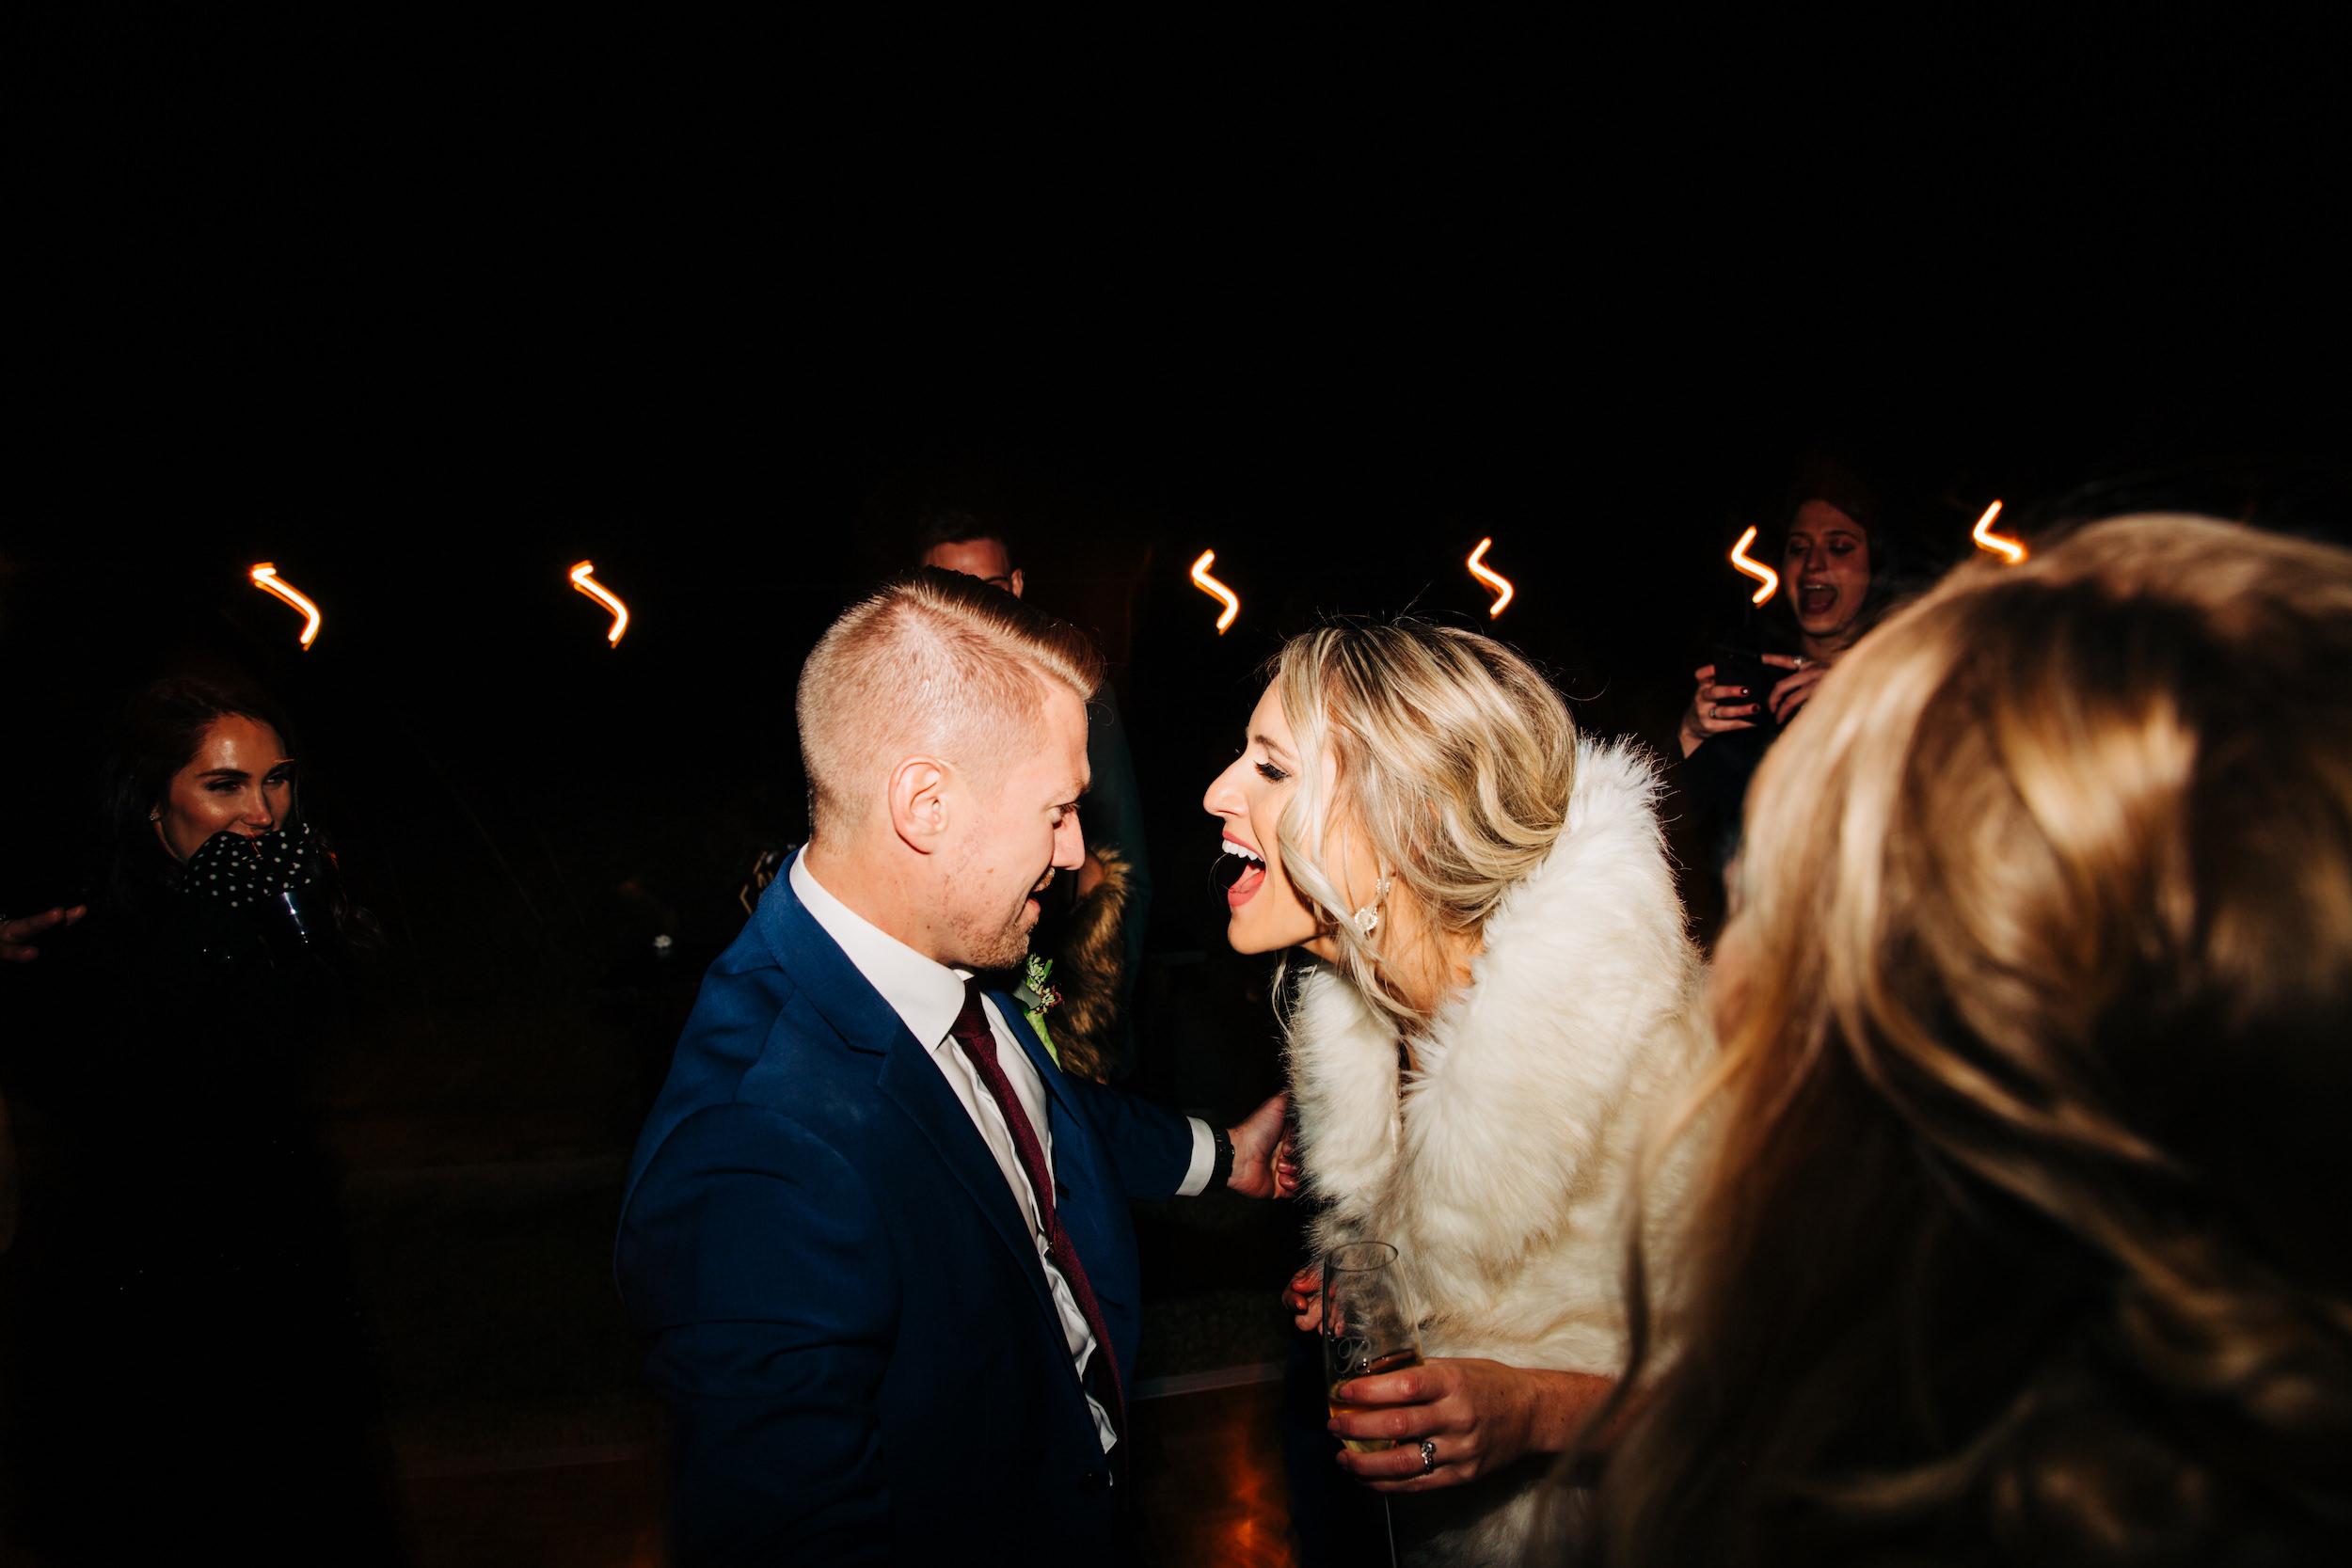 Ricky & Brittney - Reception - Jake & Katie Photography_264.jpg